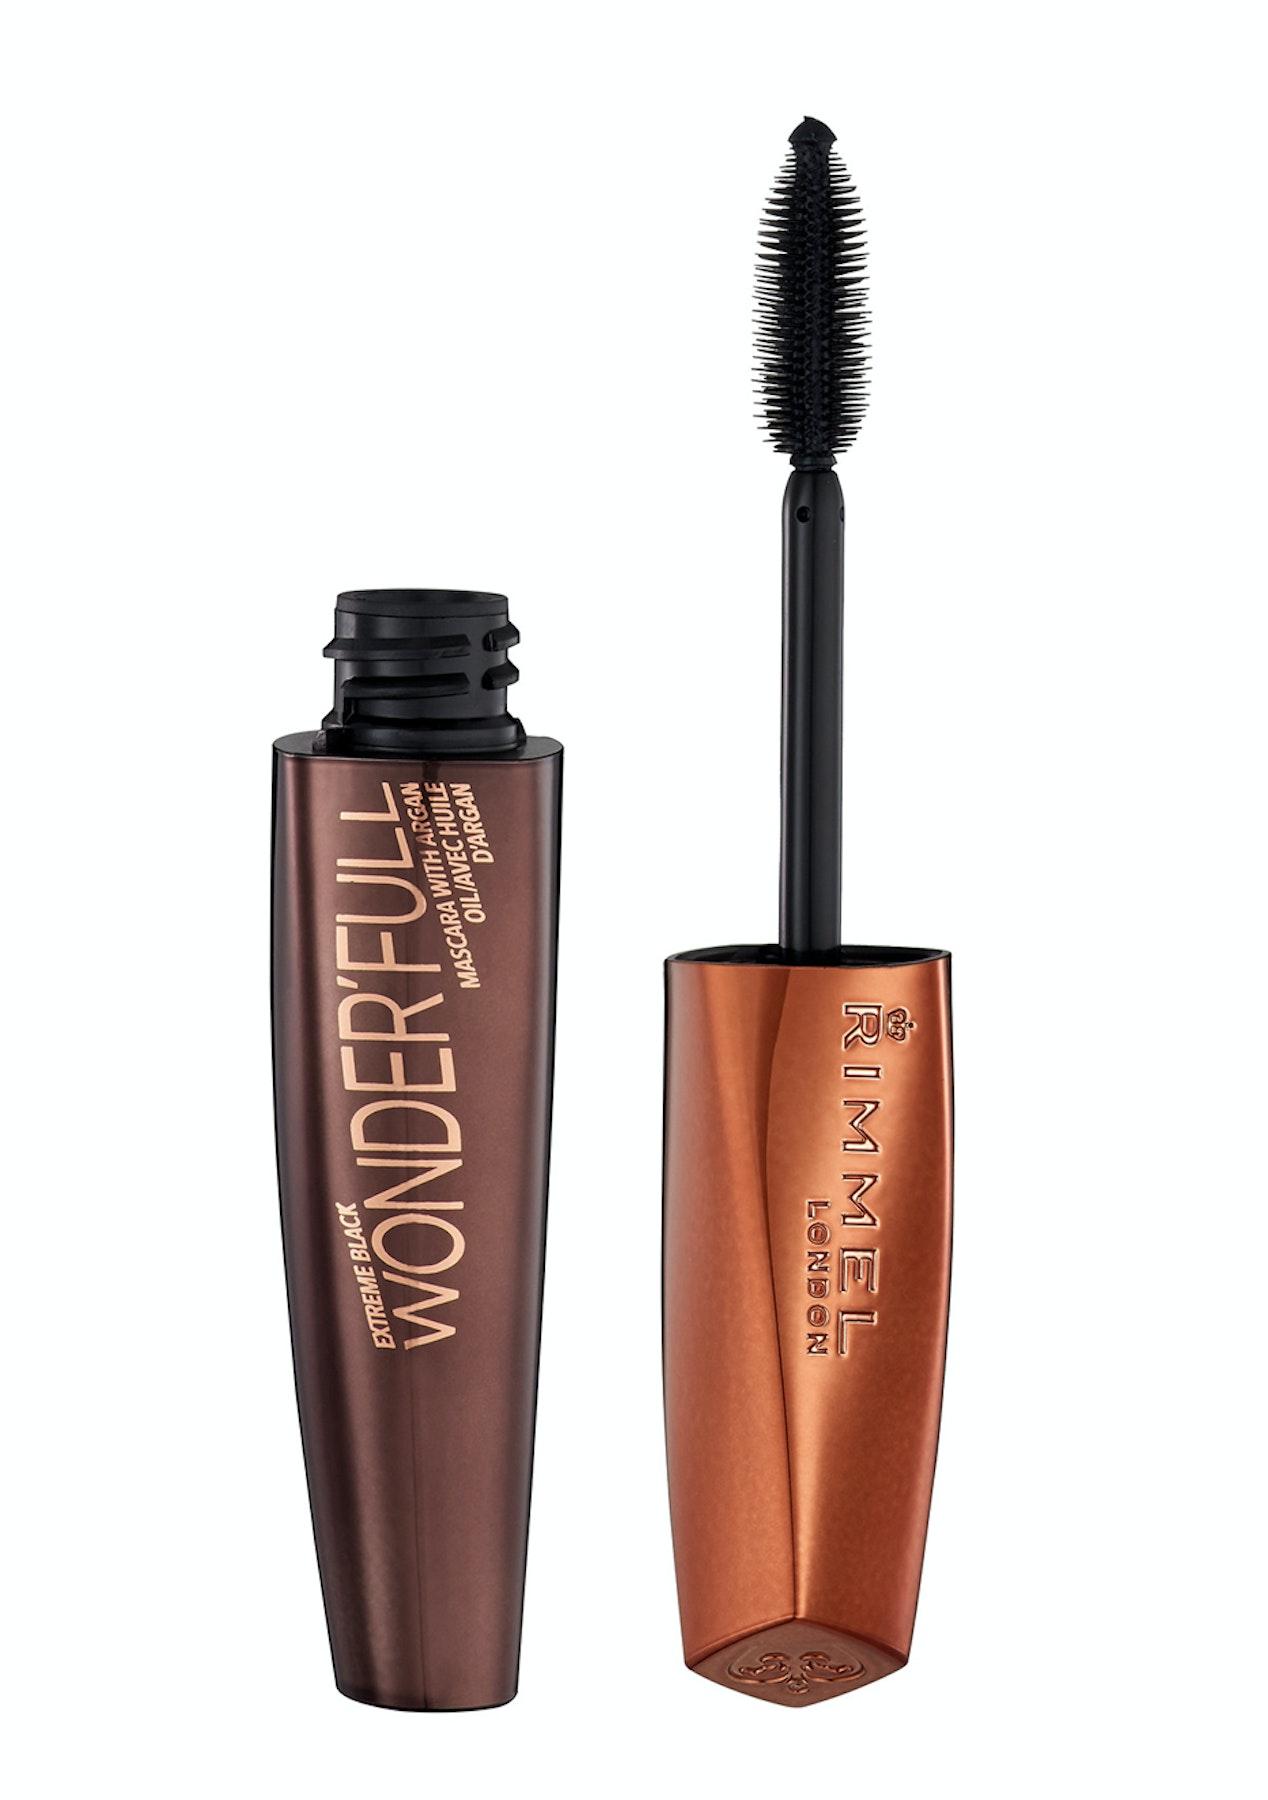 f74f1204986 Rimmel Wonderful Mascara With Argan Oil Extreme Black 003 - Big Beauty  Brand Savings - Onceit